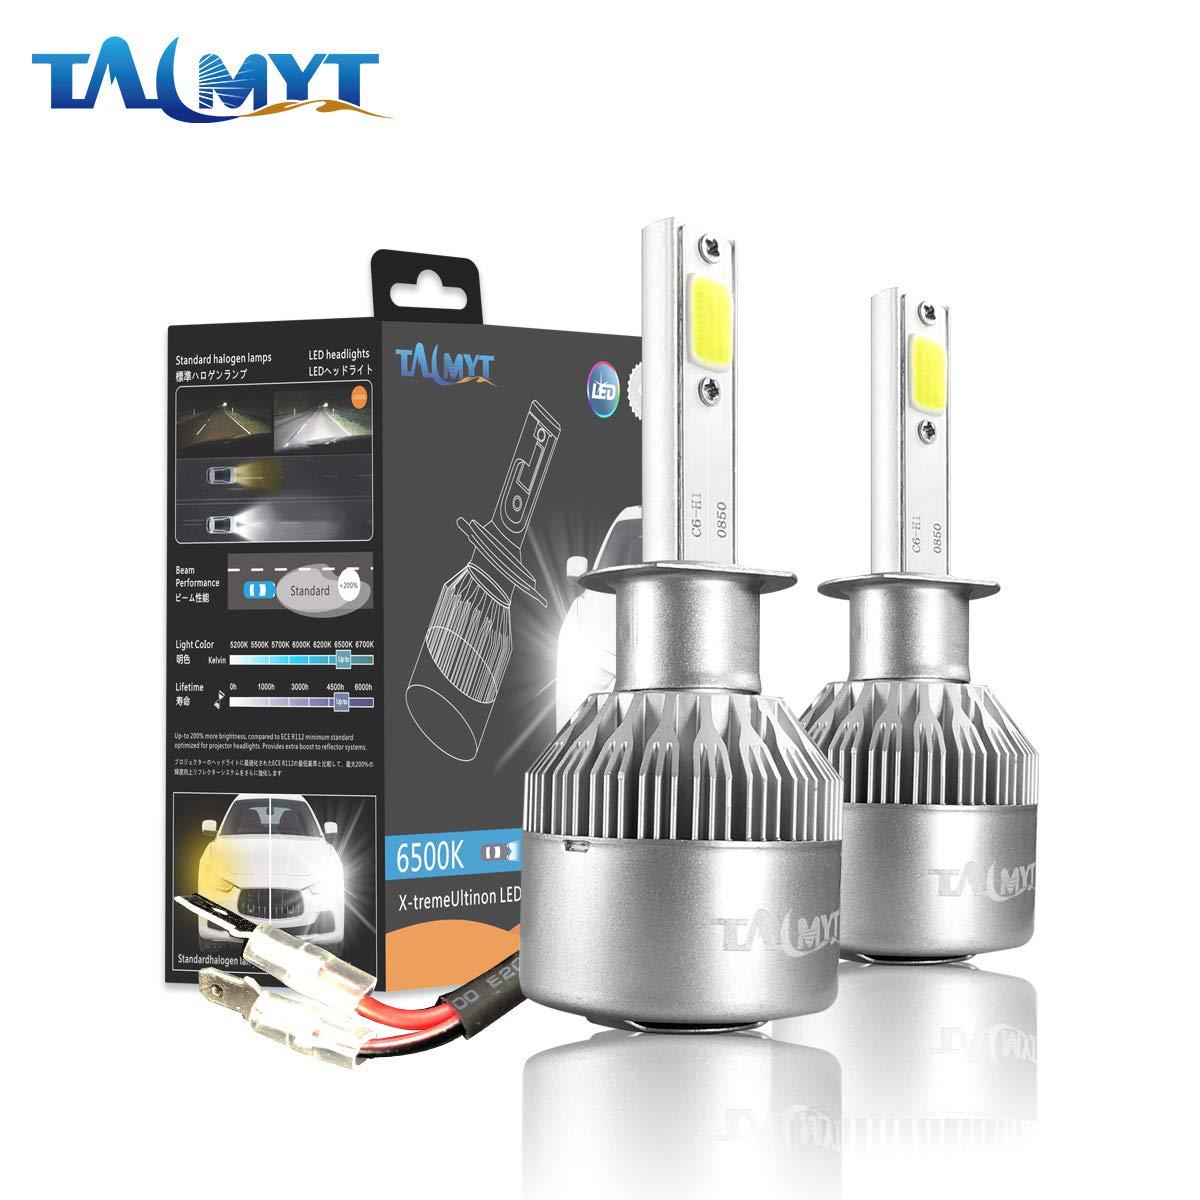 H1 LED Faro dellautomobile Kit 72W 3800LM 6000K Bianco Lamps lampadine led h1